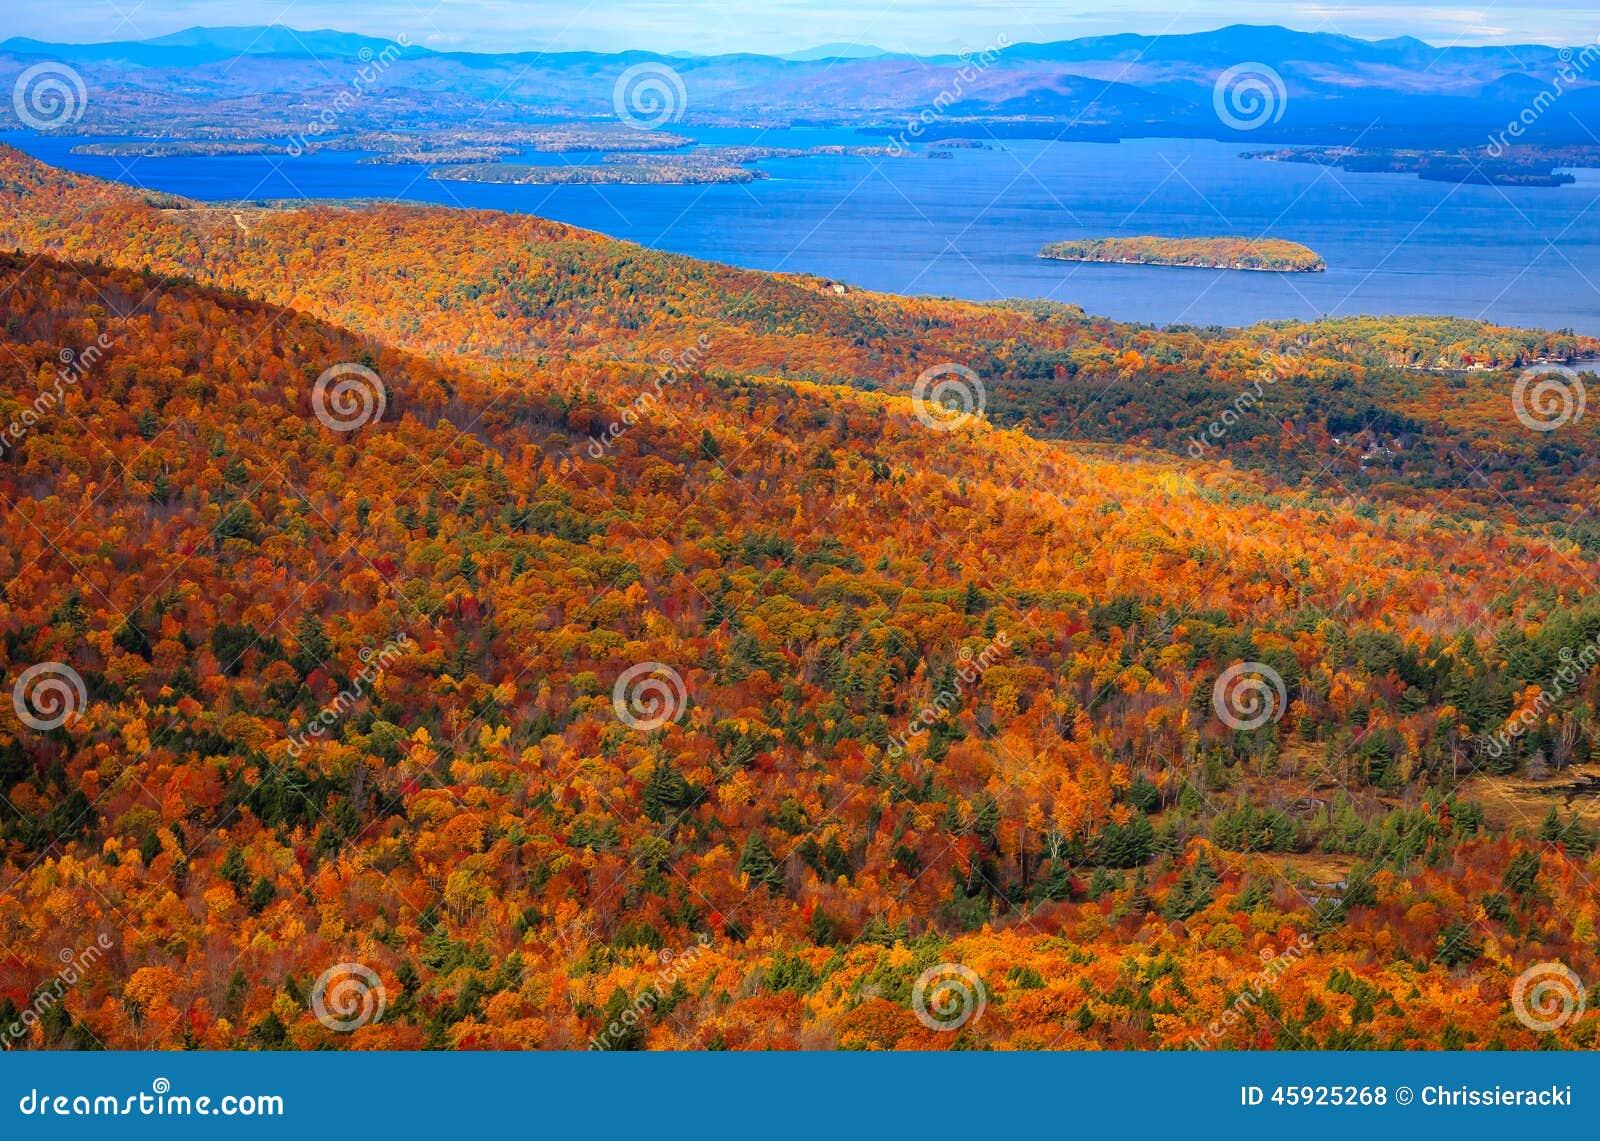 Bunter Autumn Landscape mit Seeblick